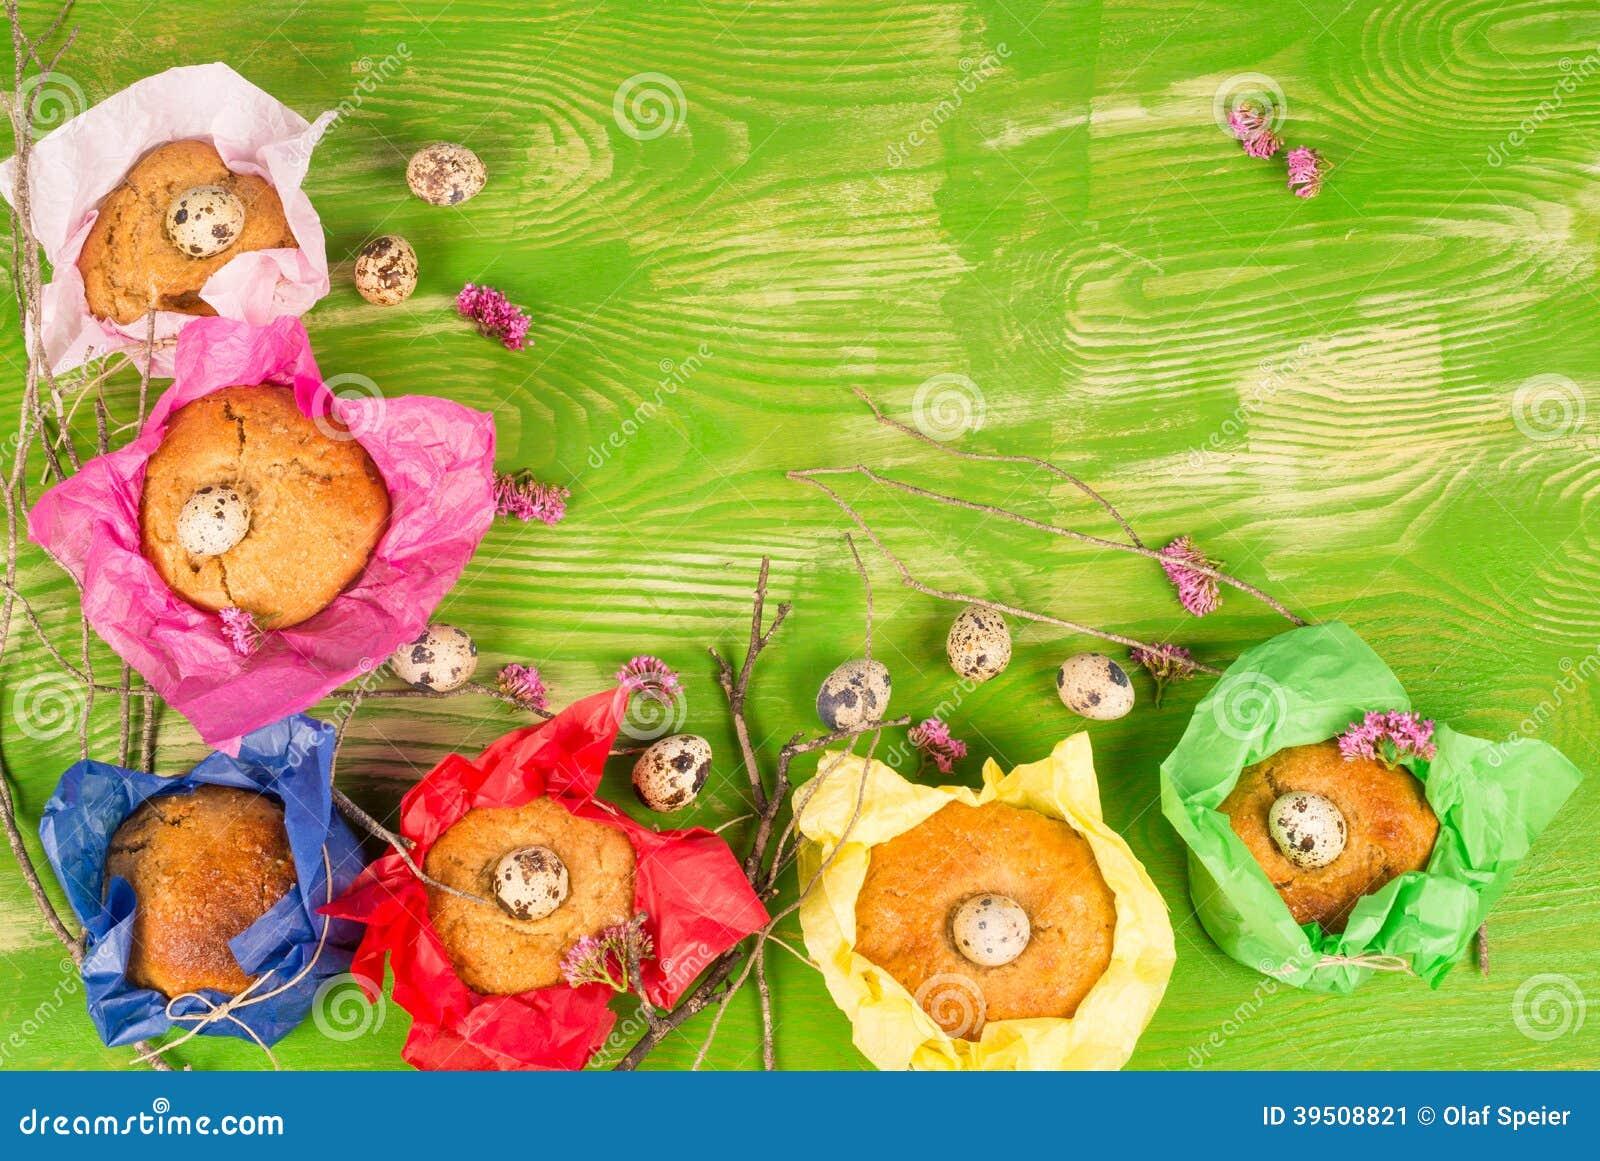 Easter kid food background